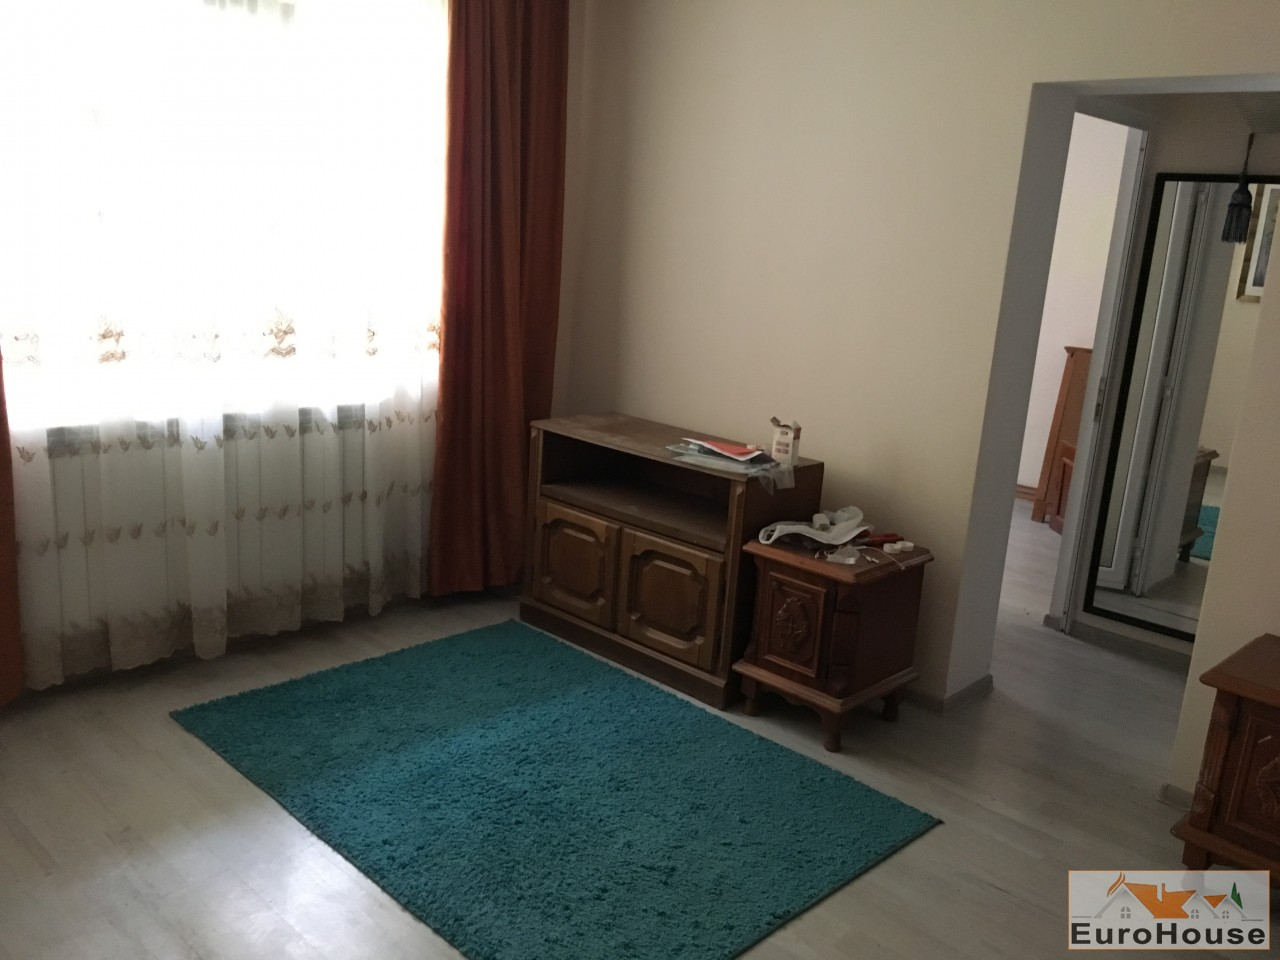 Apartament 2 camere de vanzare Alba Iulia -34207-